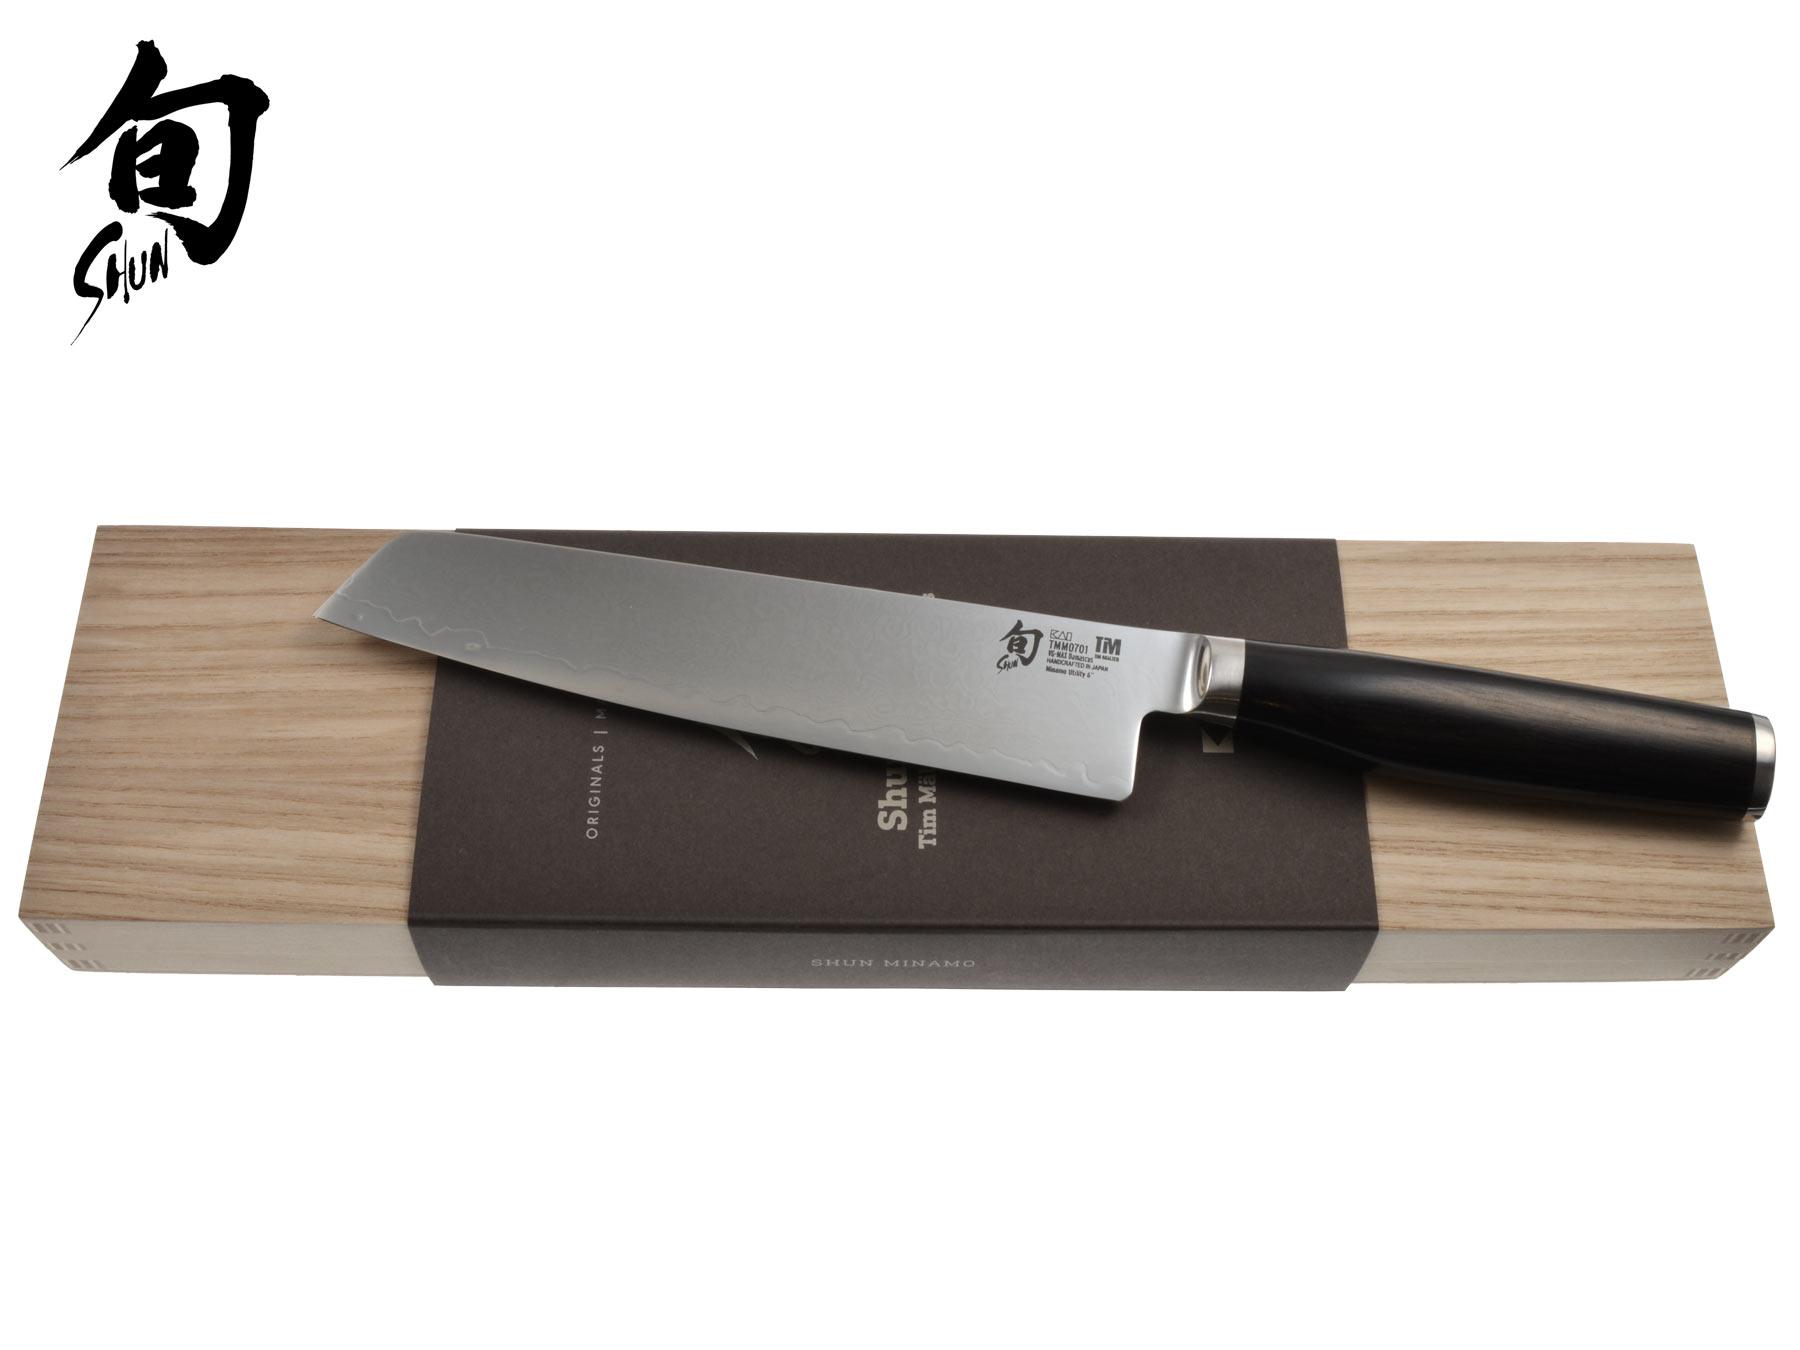 KAI Shun Premier Minamo TMM-0701 Allzweckmesser - 15 cm